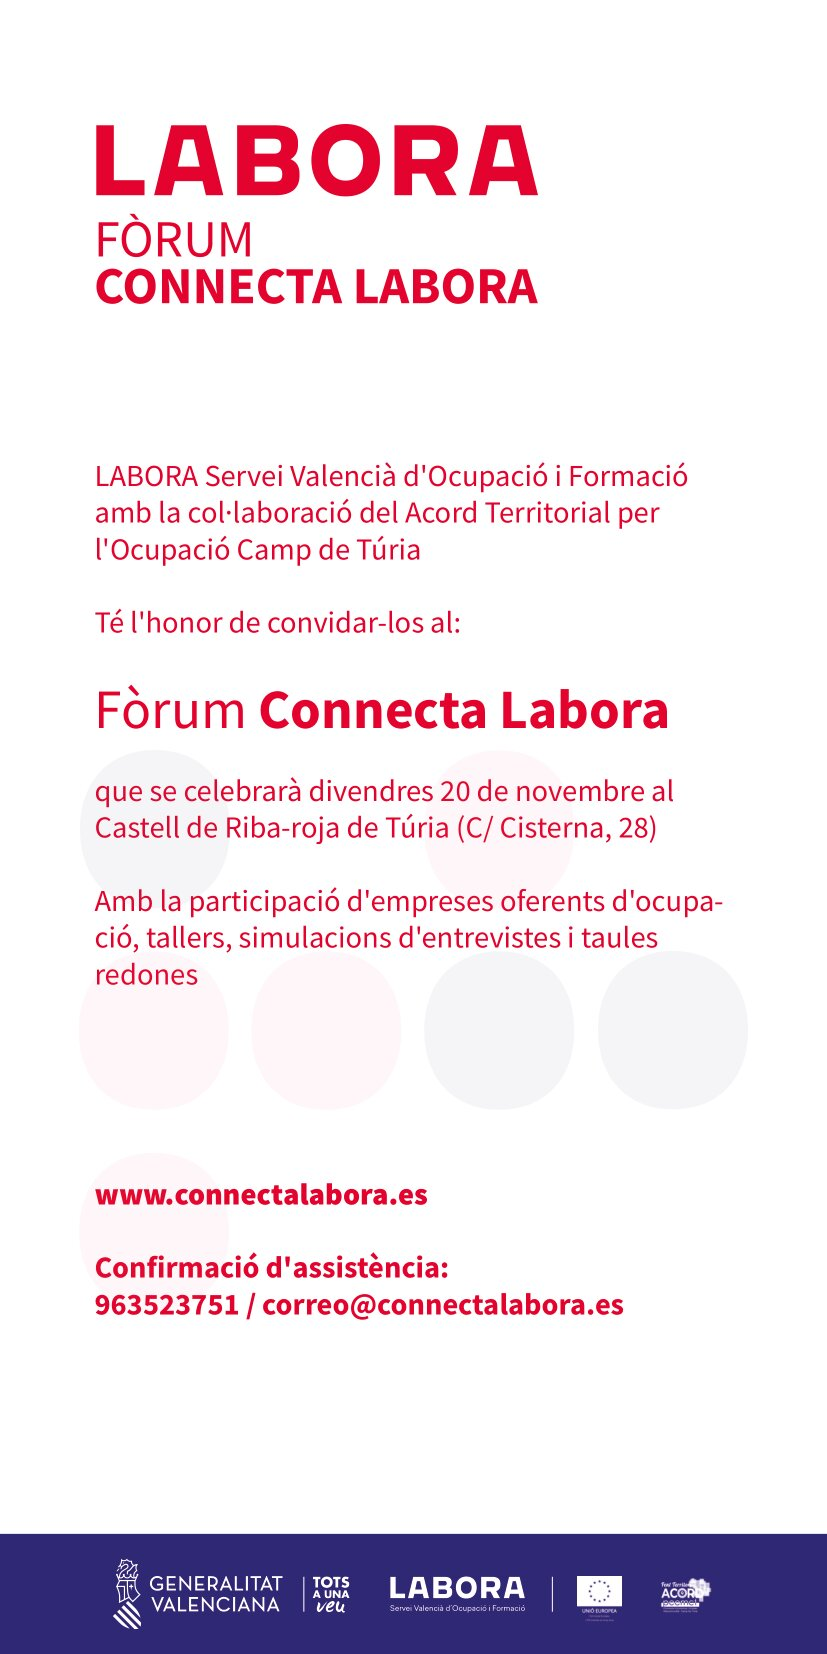 LABORA celebra su próximo foro sobre empleo el 20 de noviembre en Riba-roja de Túria